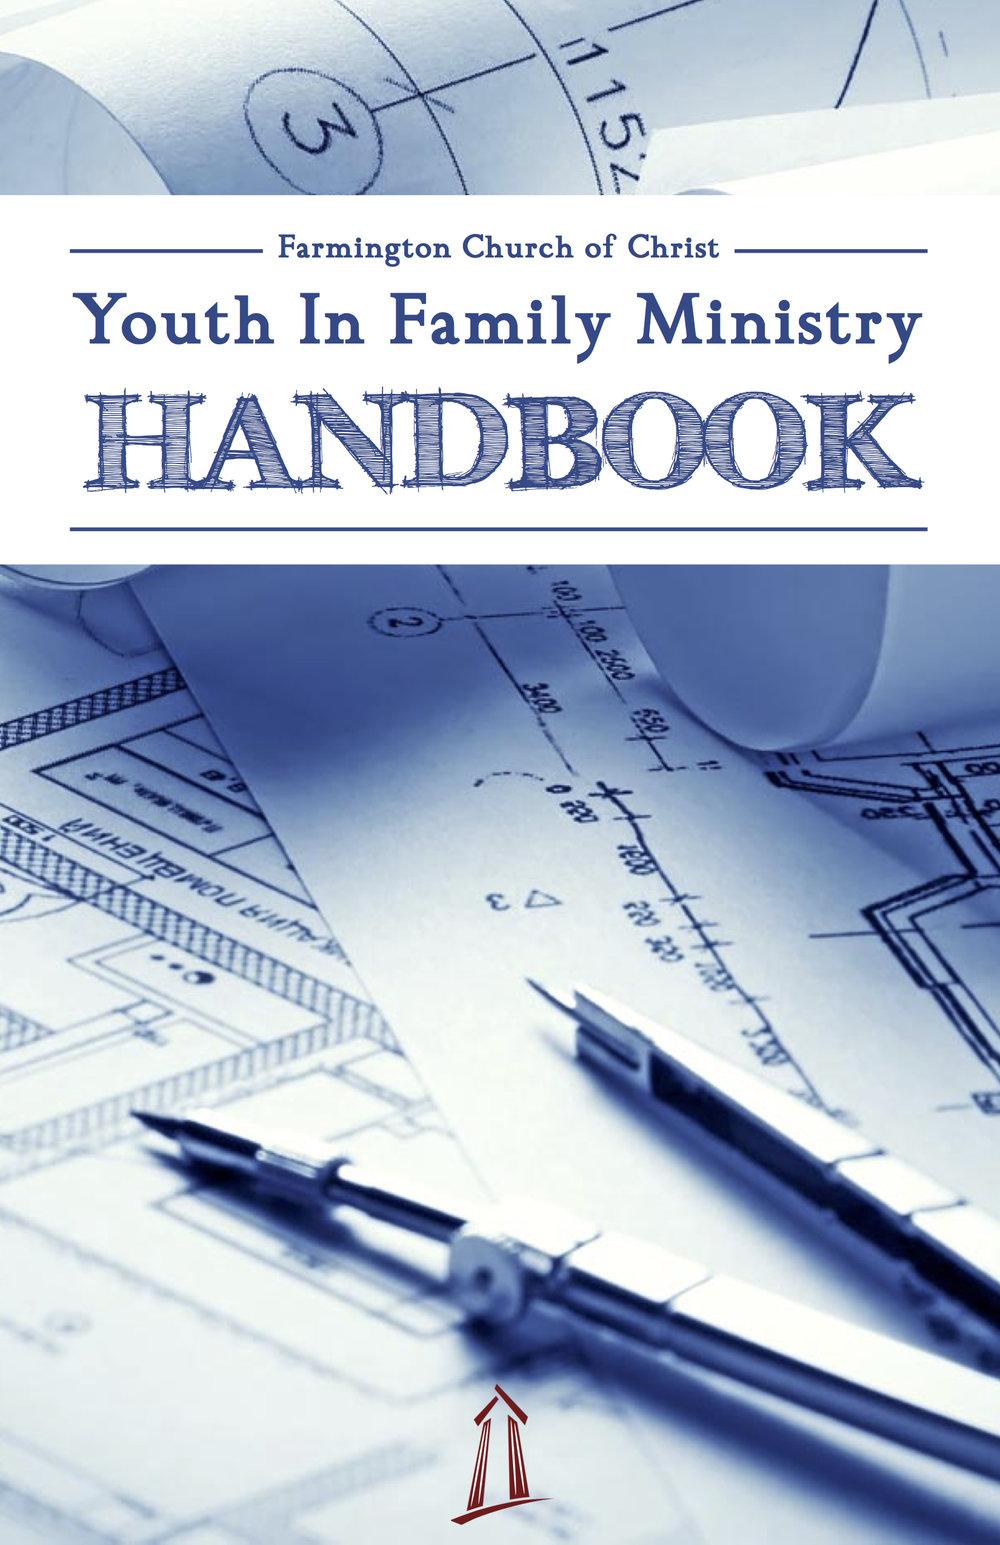 YIFM Handbook cover.jpg